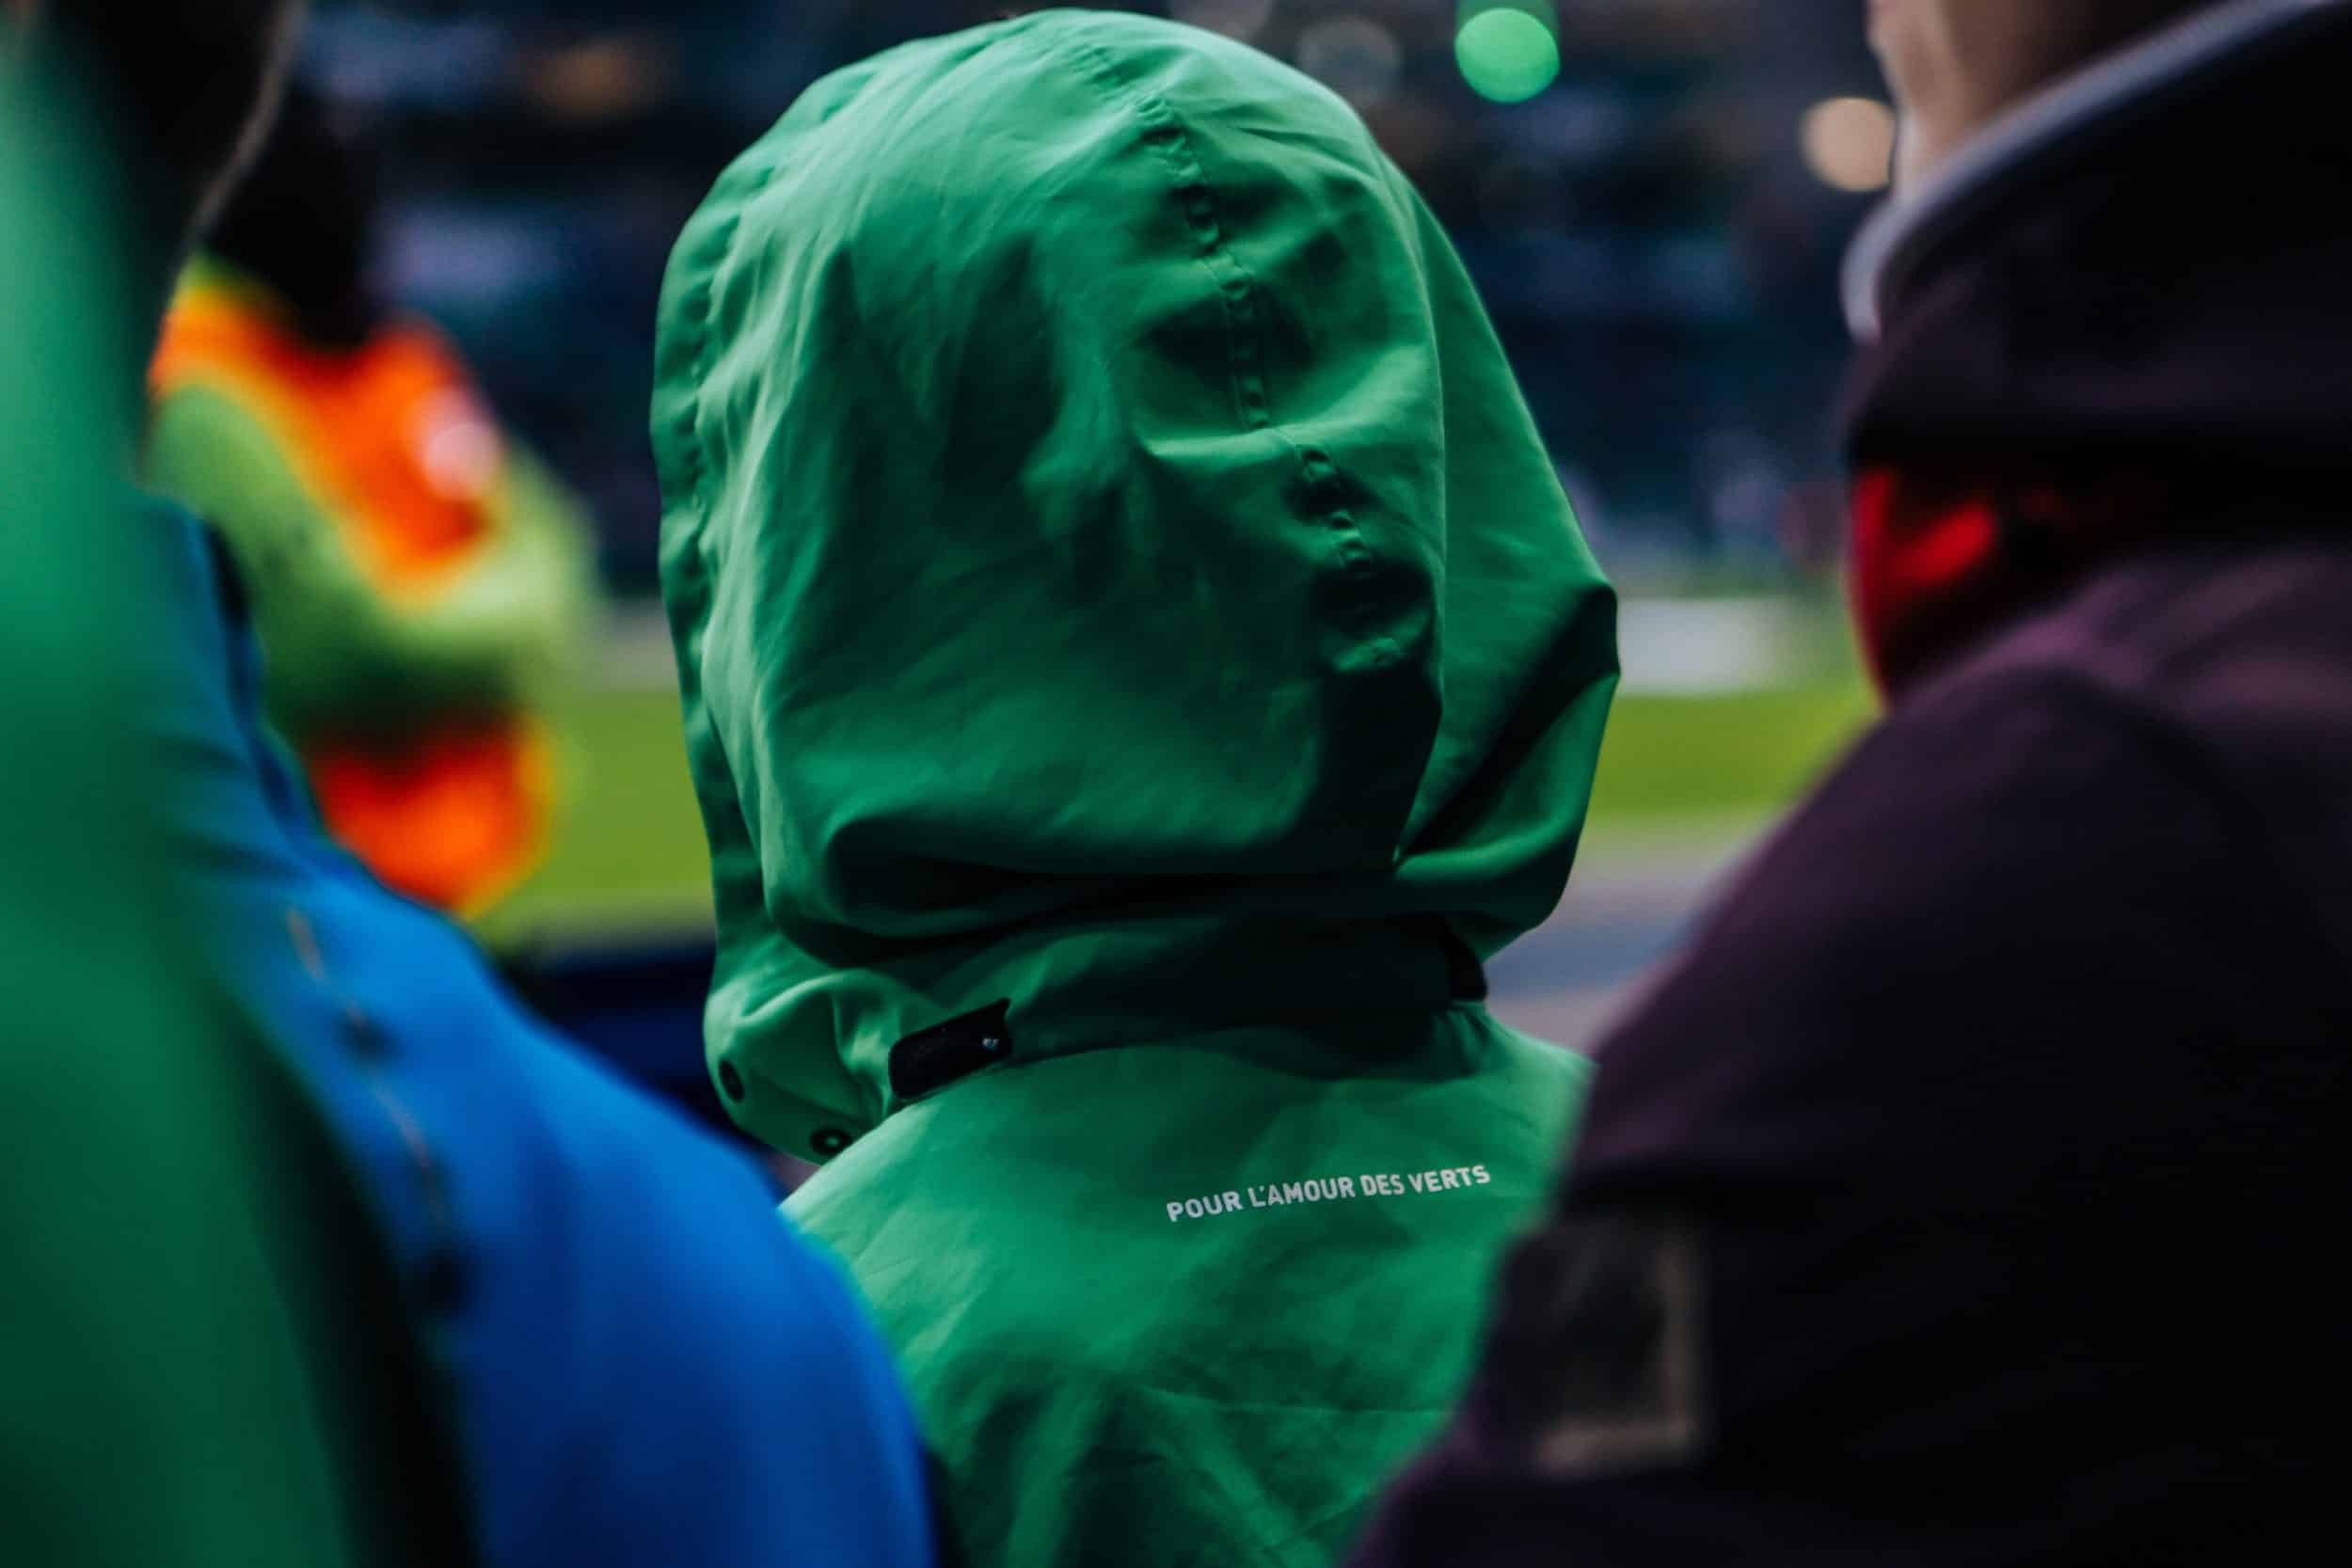 au-stade-geoffroy-guichard-asse-manchester-united-europa-league-9-min